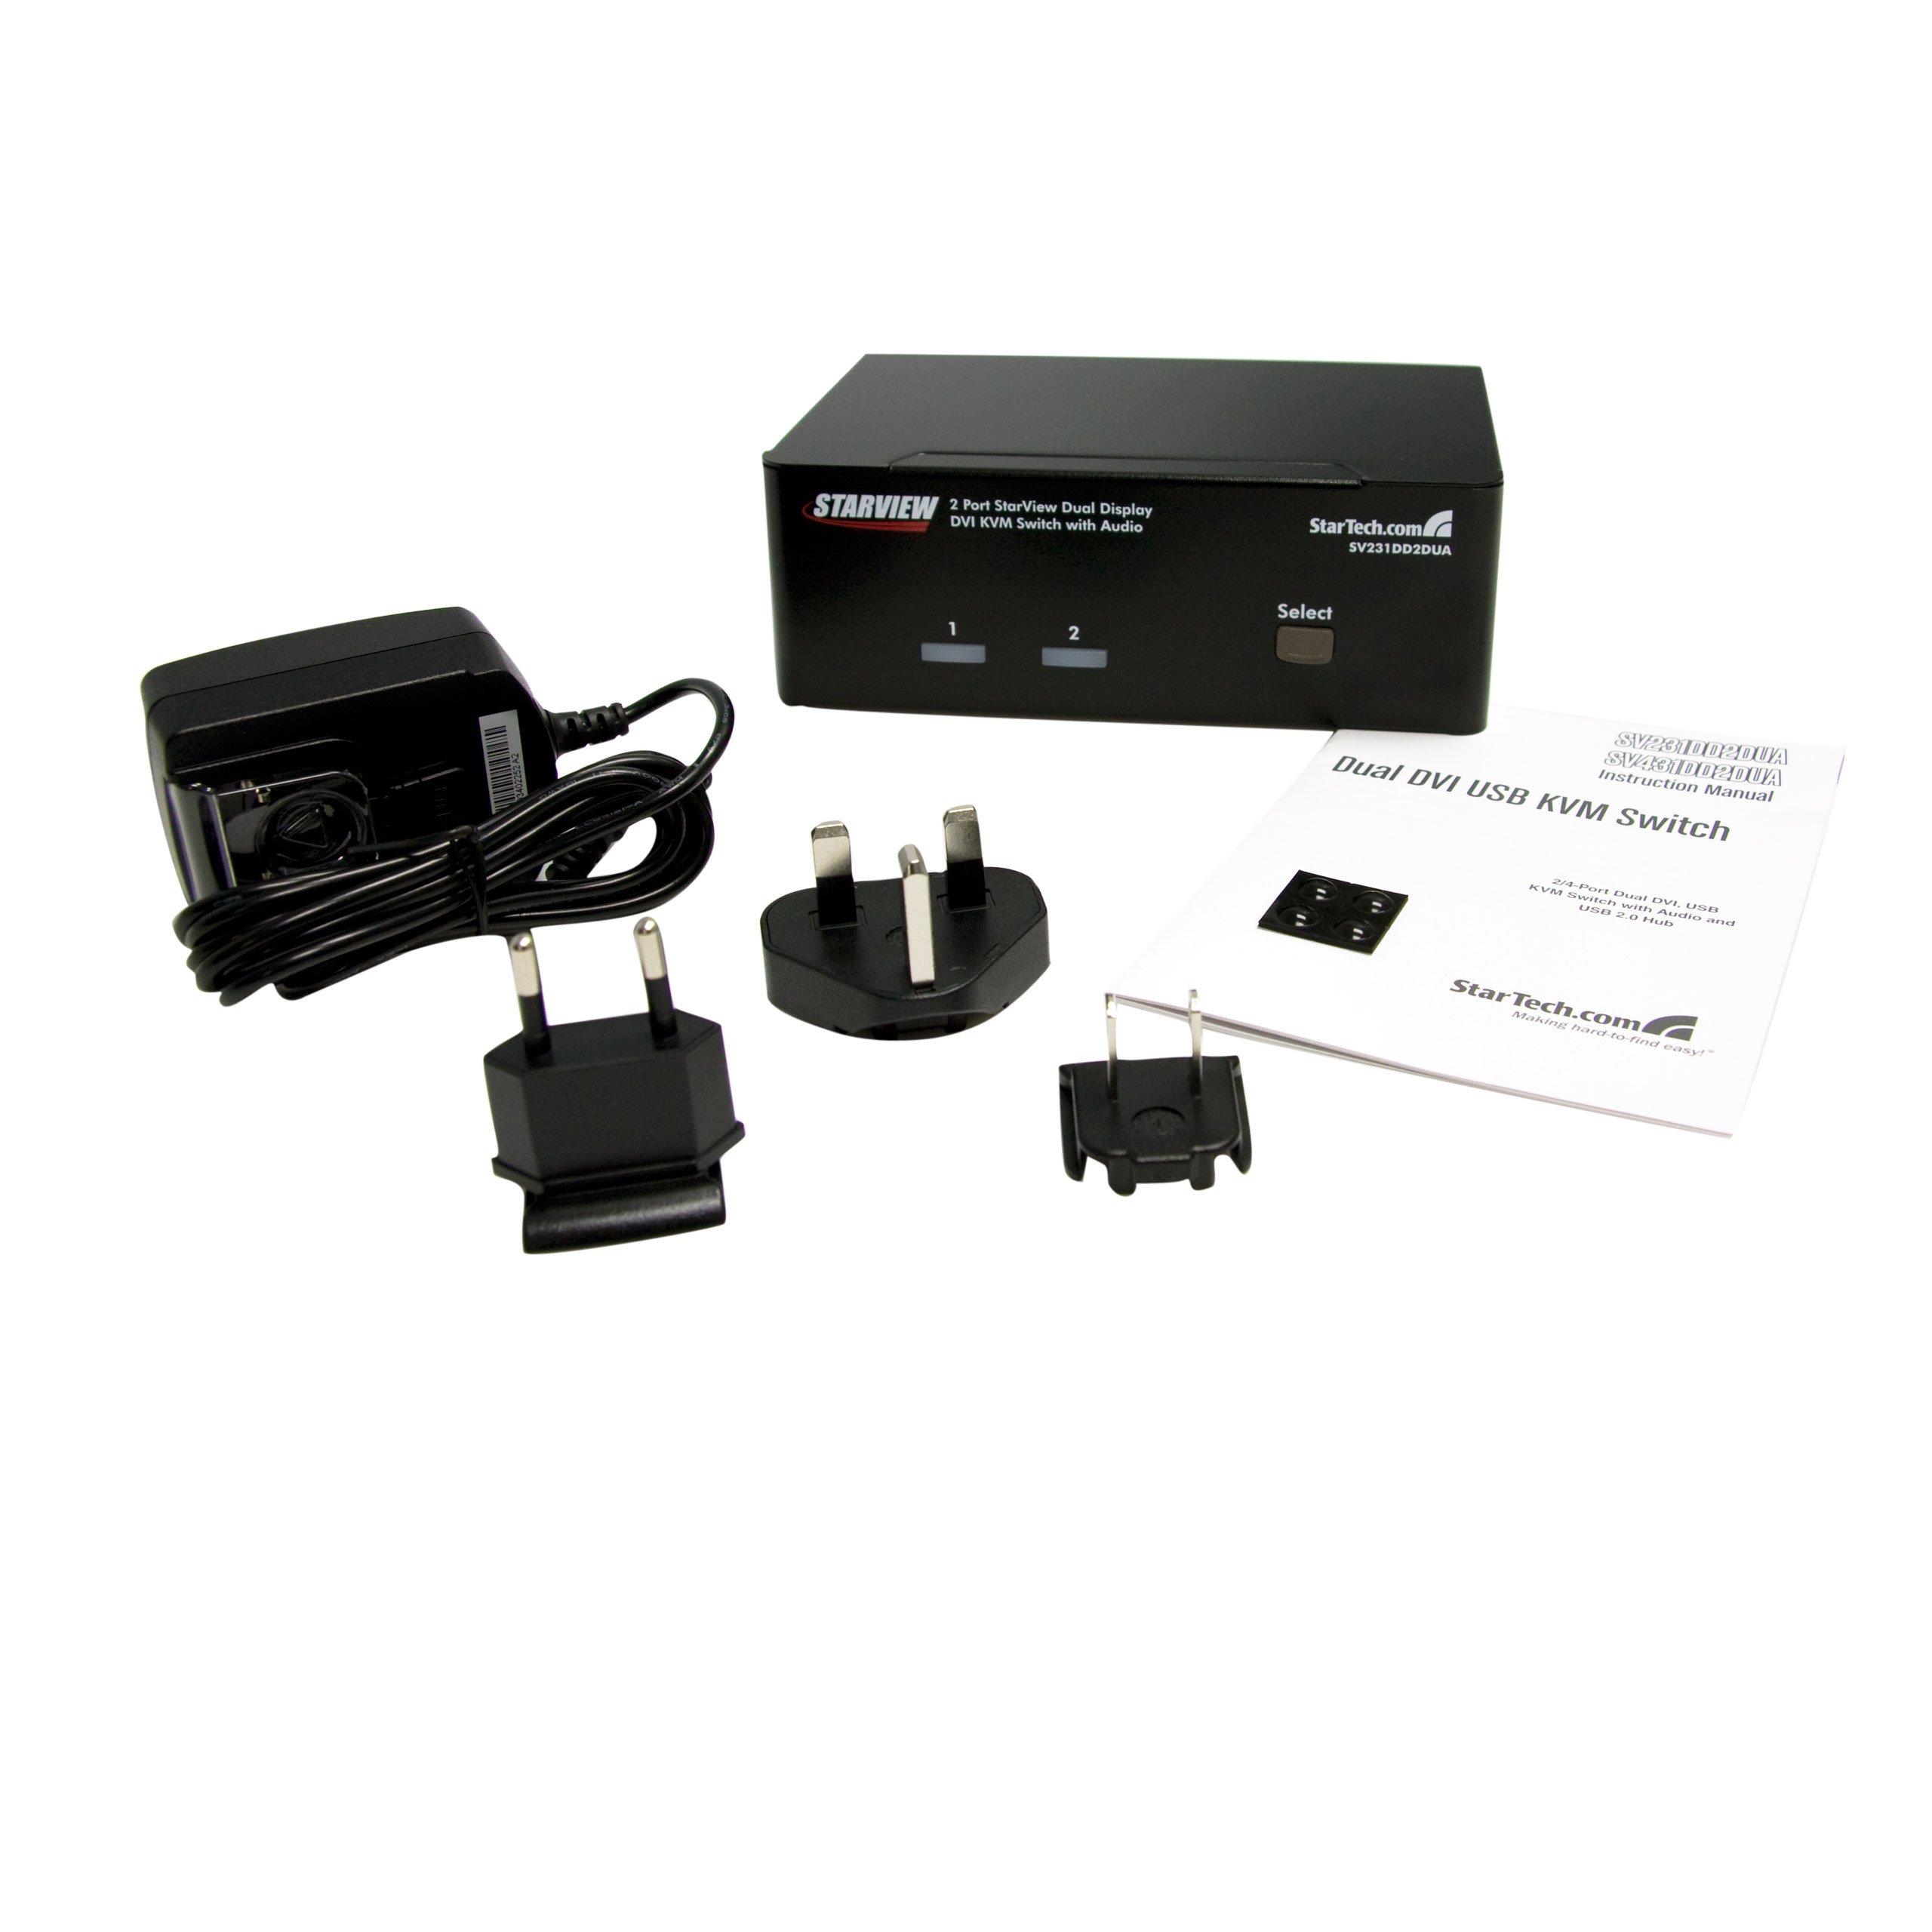 StarTech.com 2 Port Dual DVI USB KVM Switch with Audio and USB 2.0 Hub (SV231DD2DUA) by StarTech (Image #4)